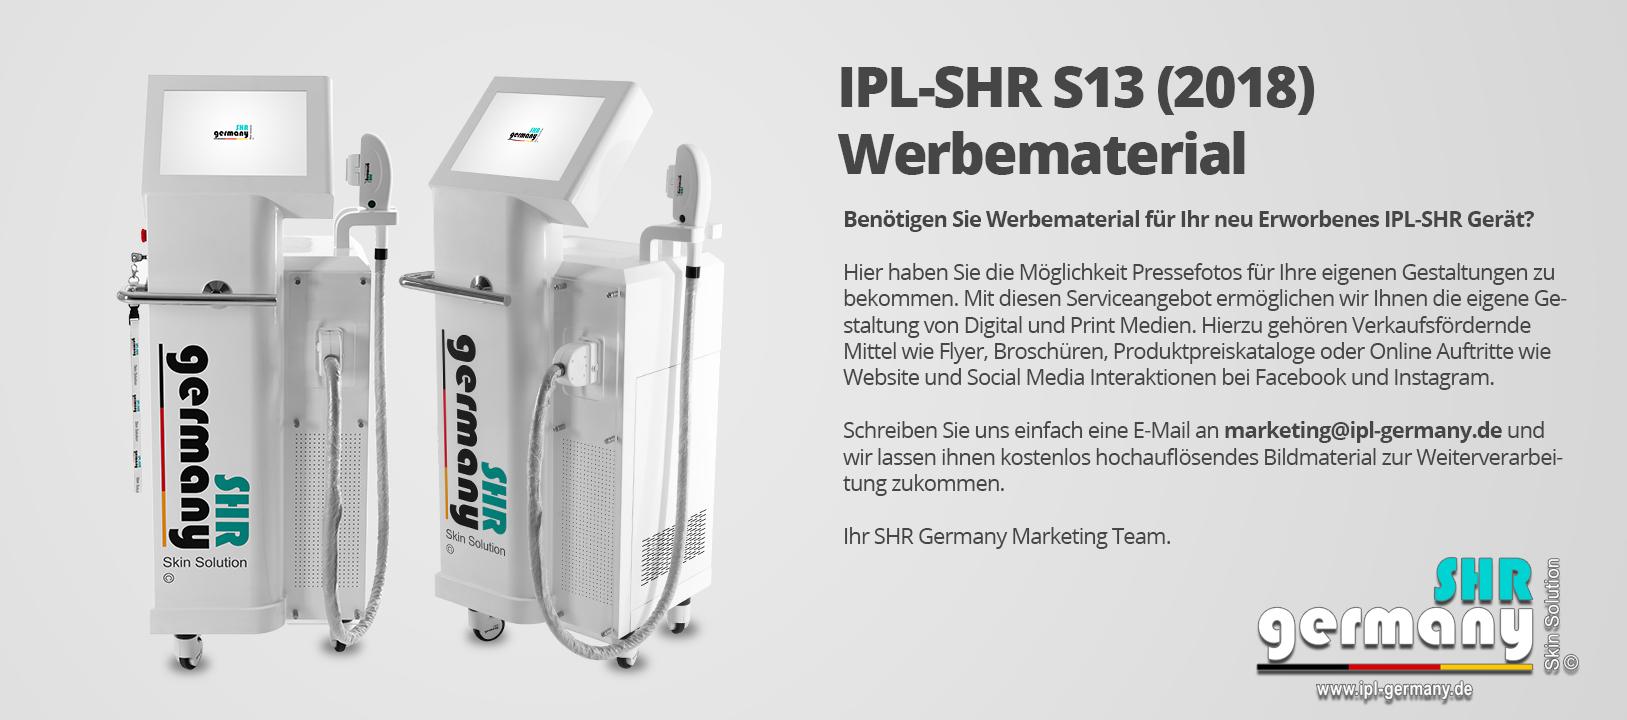 SHR-Germany_PMU_S13_Werbematerial_2018